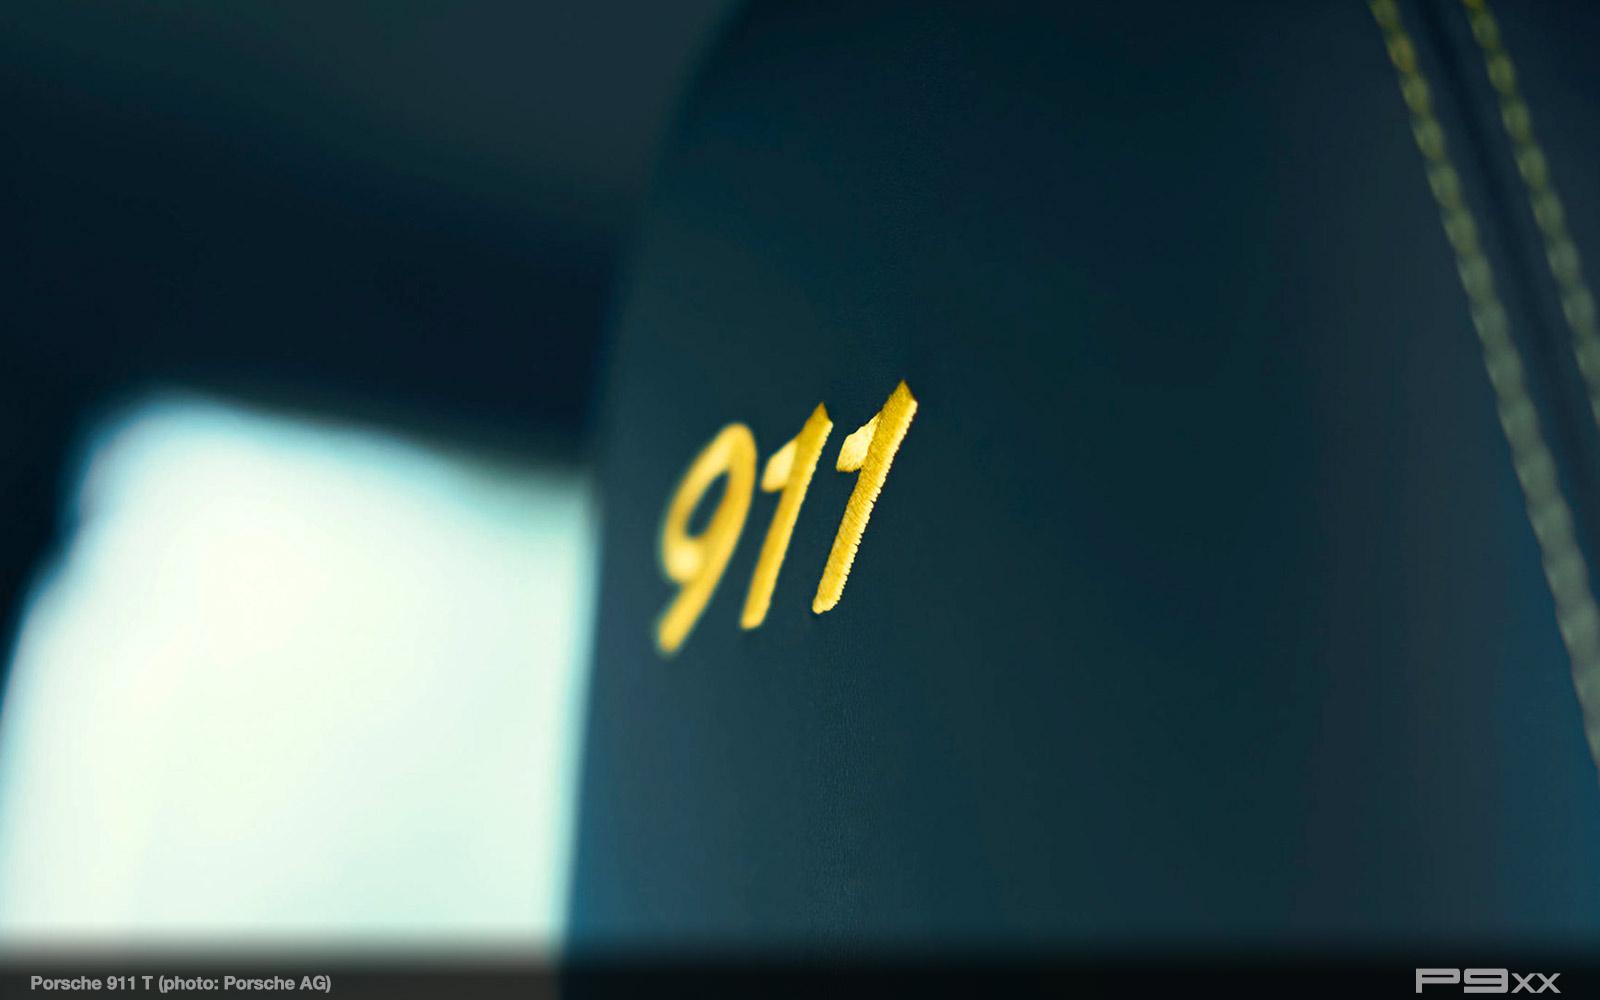 Porsche-911-Carrera-T-324